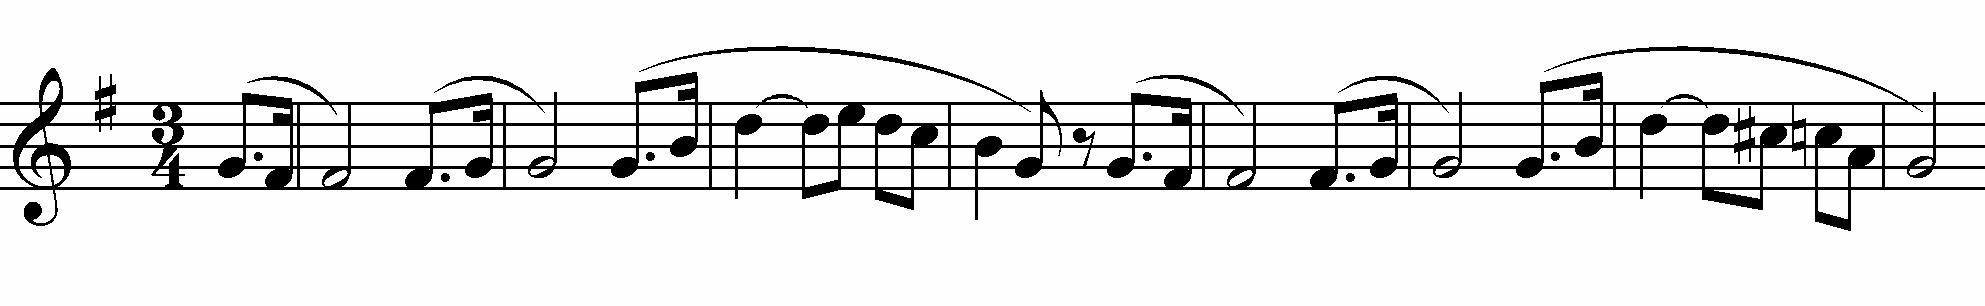 sonatabeethoven